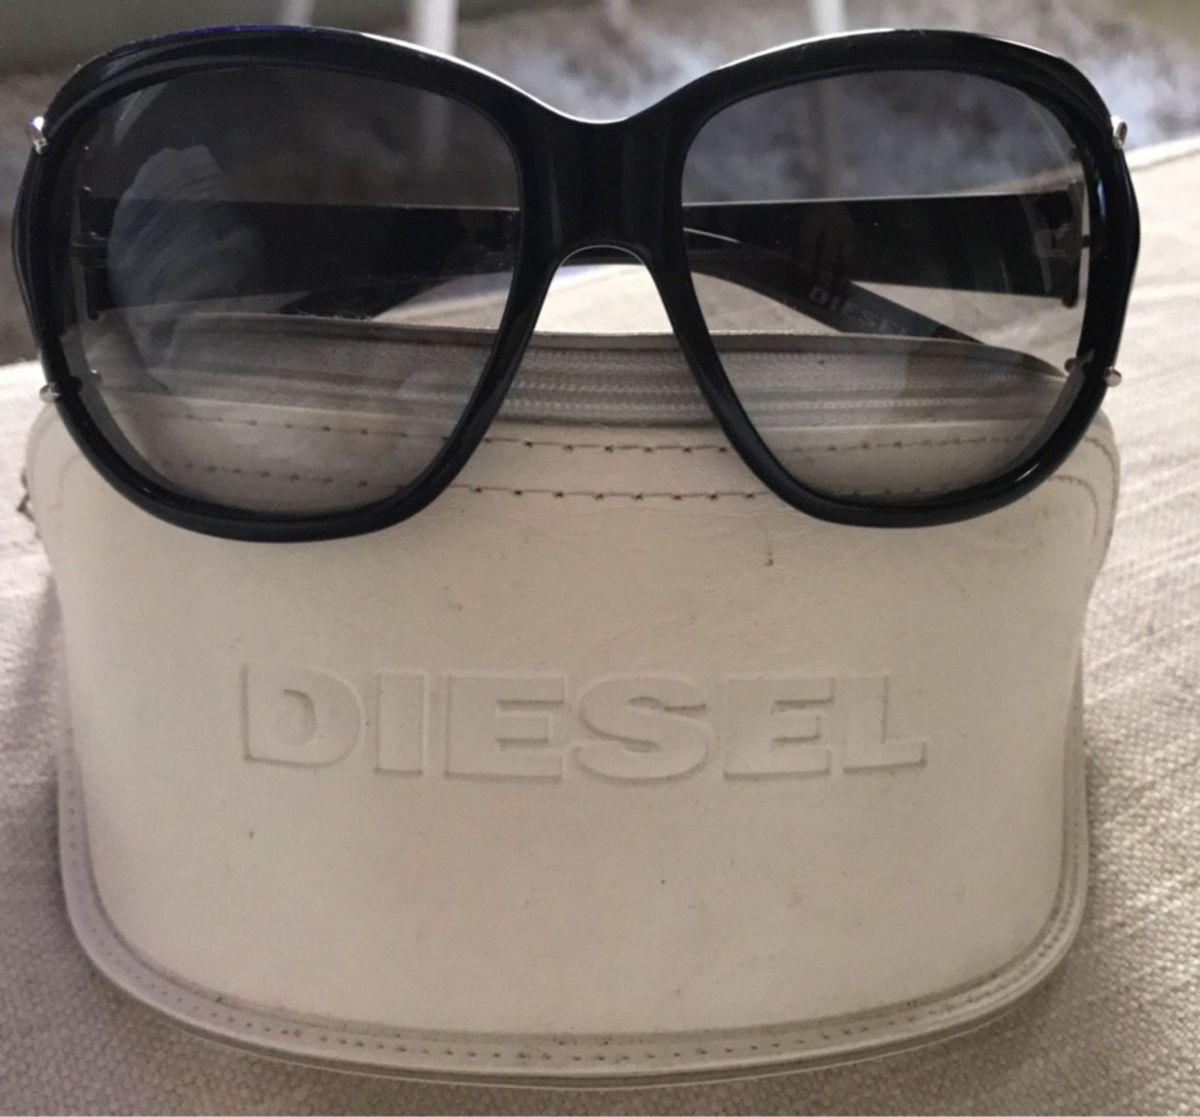 oculos de sol diesel - óculos diesel.  Czm6ly9wag90b3muzw5qb2vplmnvbs5ici9wcm9kdwn0cy80njc4nja5lzmymgyyogyxntnjogjlyjjlnju3zguxyjlln2vlowy4lmpwzw  ... c3ae29fba6